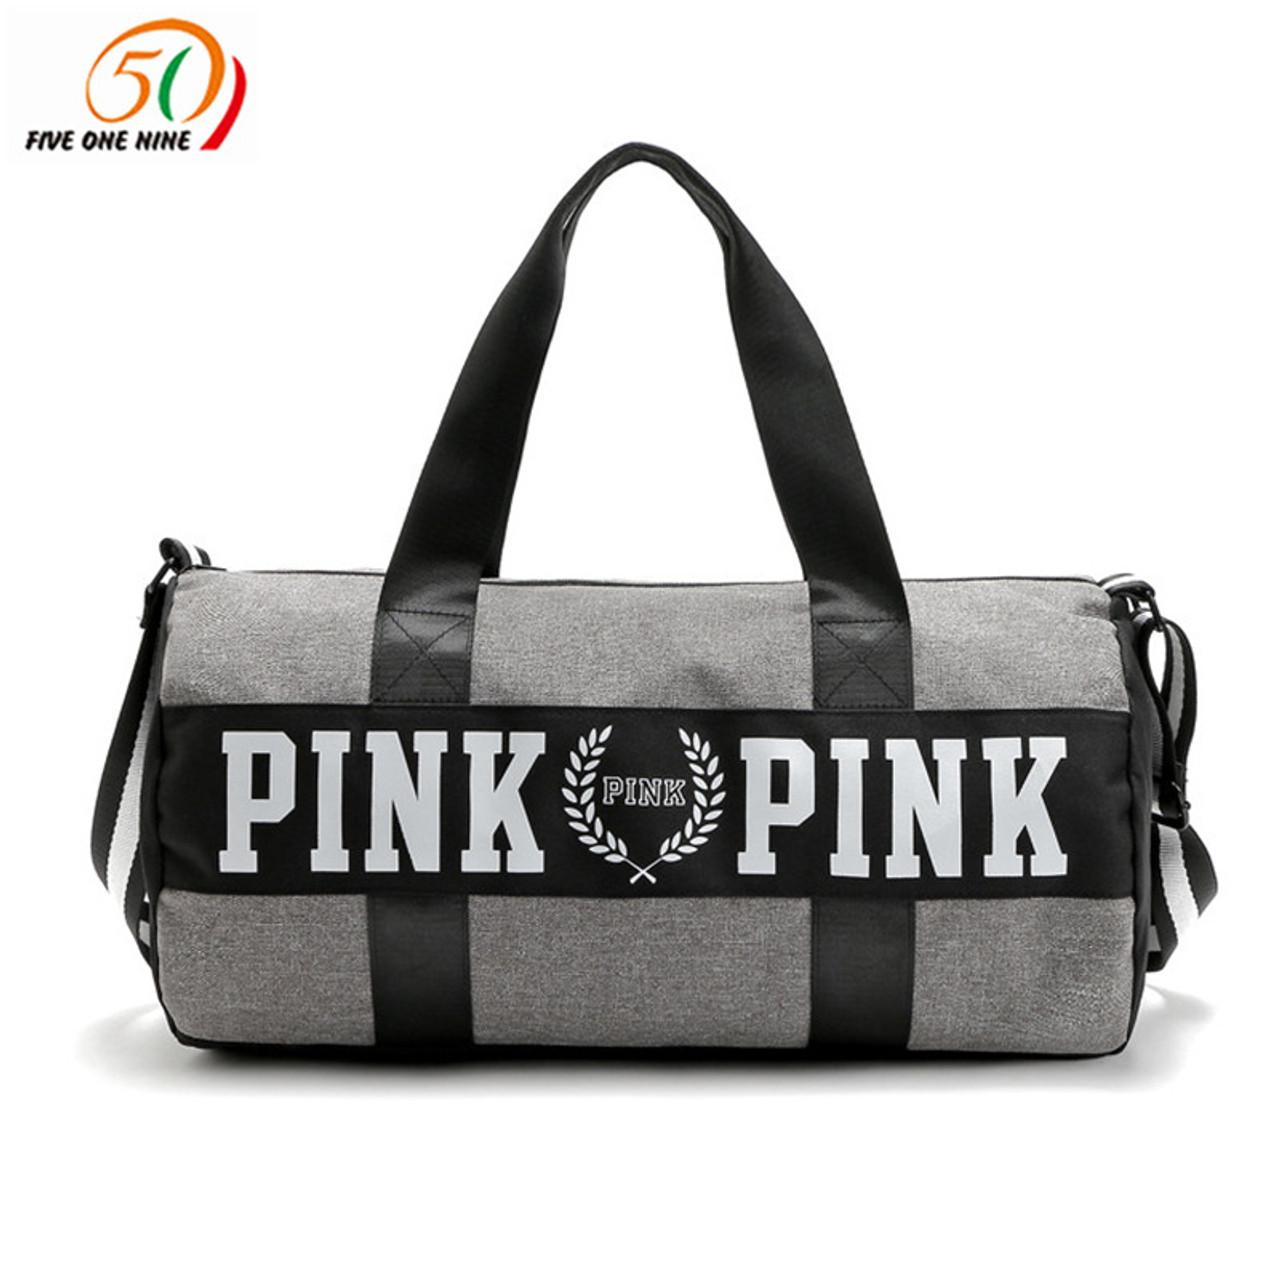 ... fashion girl stripe duffle bag pink Victoria beach shoulder bag large  capacity secret Overnight weekender vs ... f29576547d